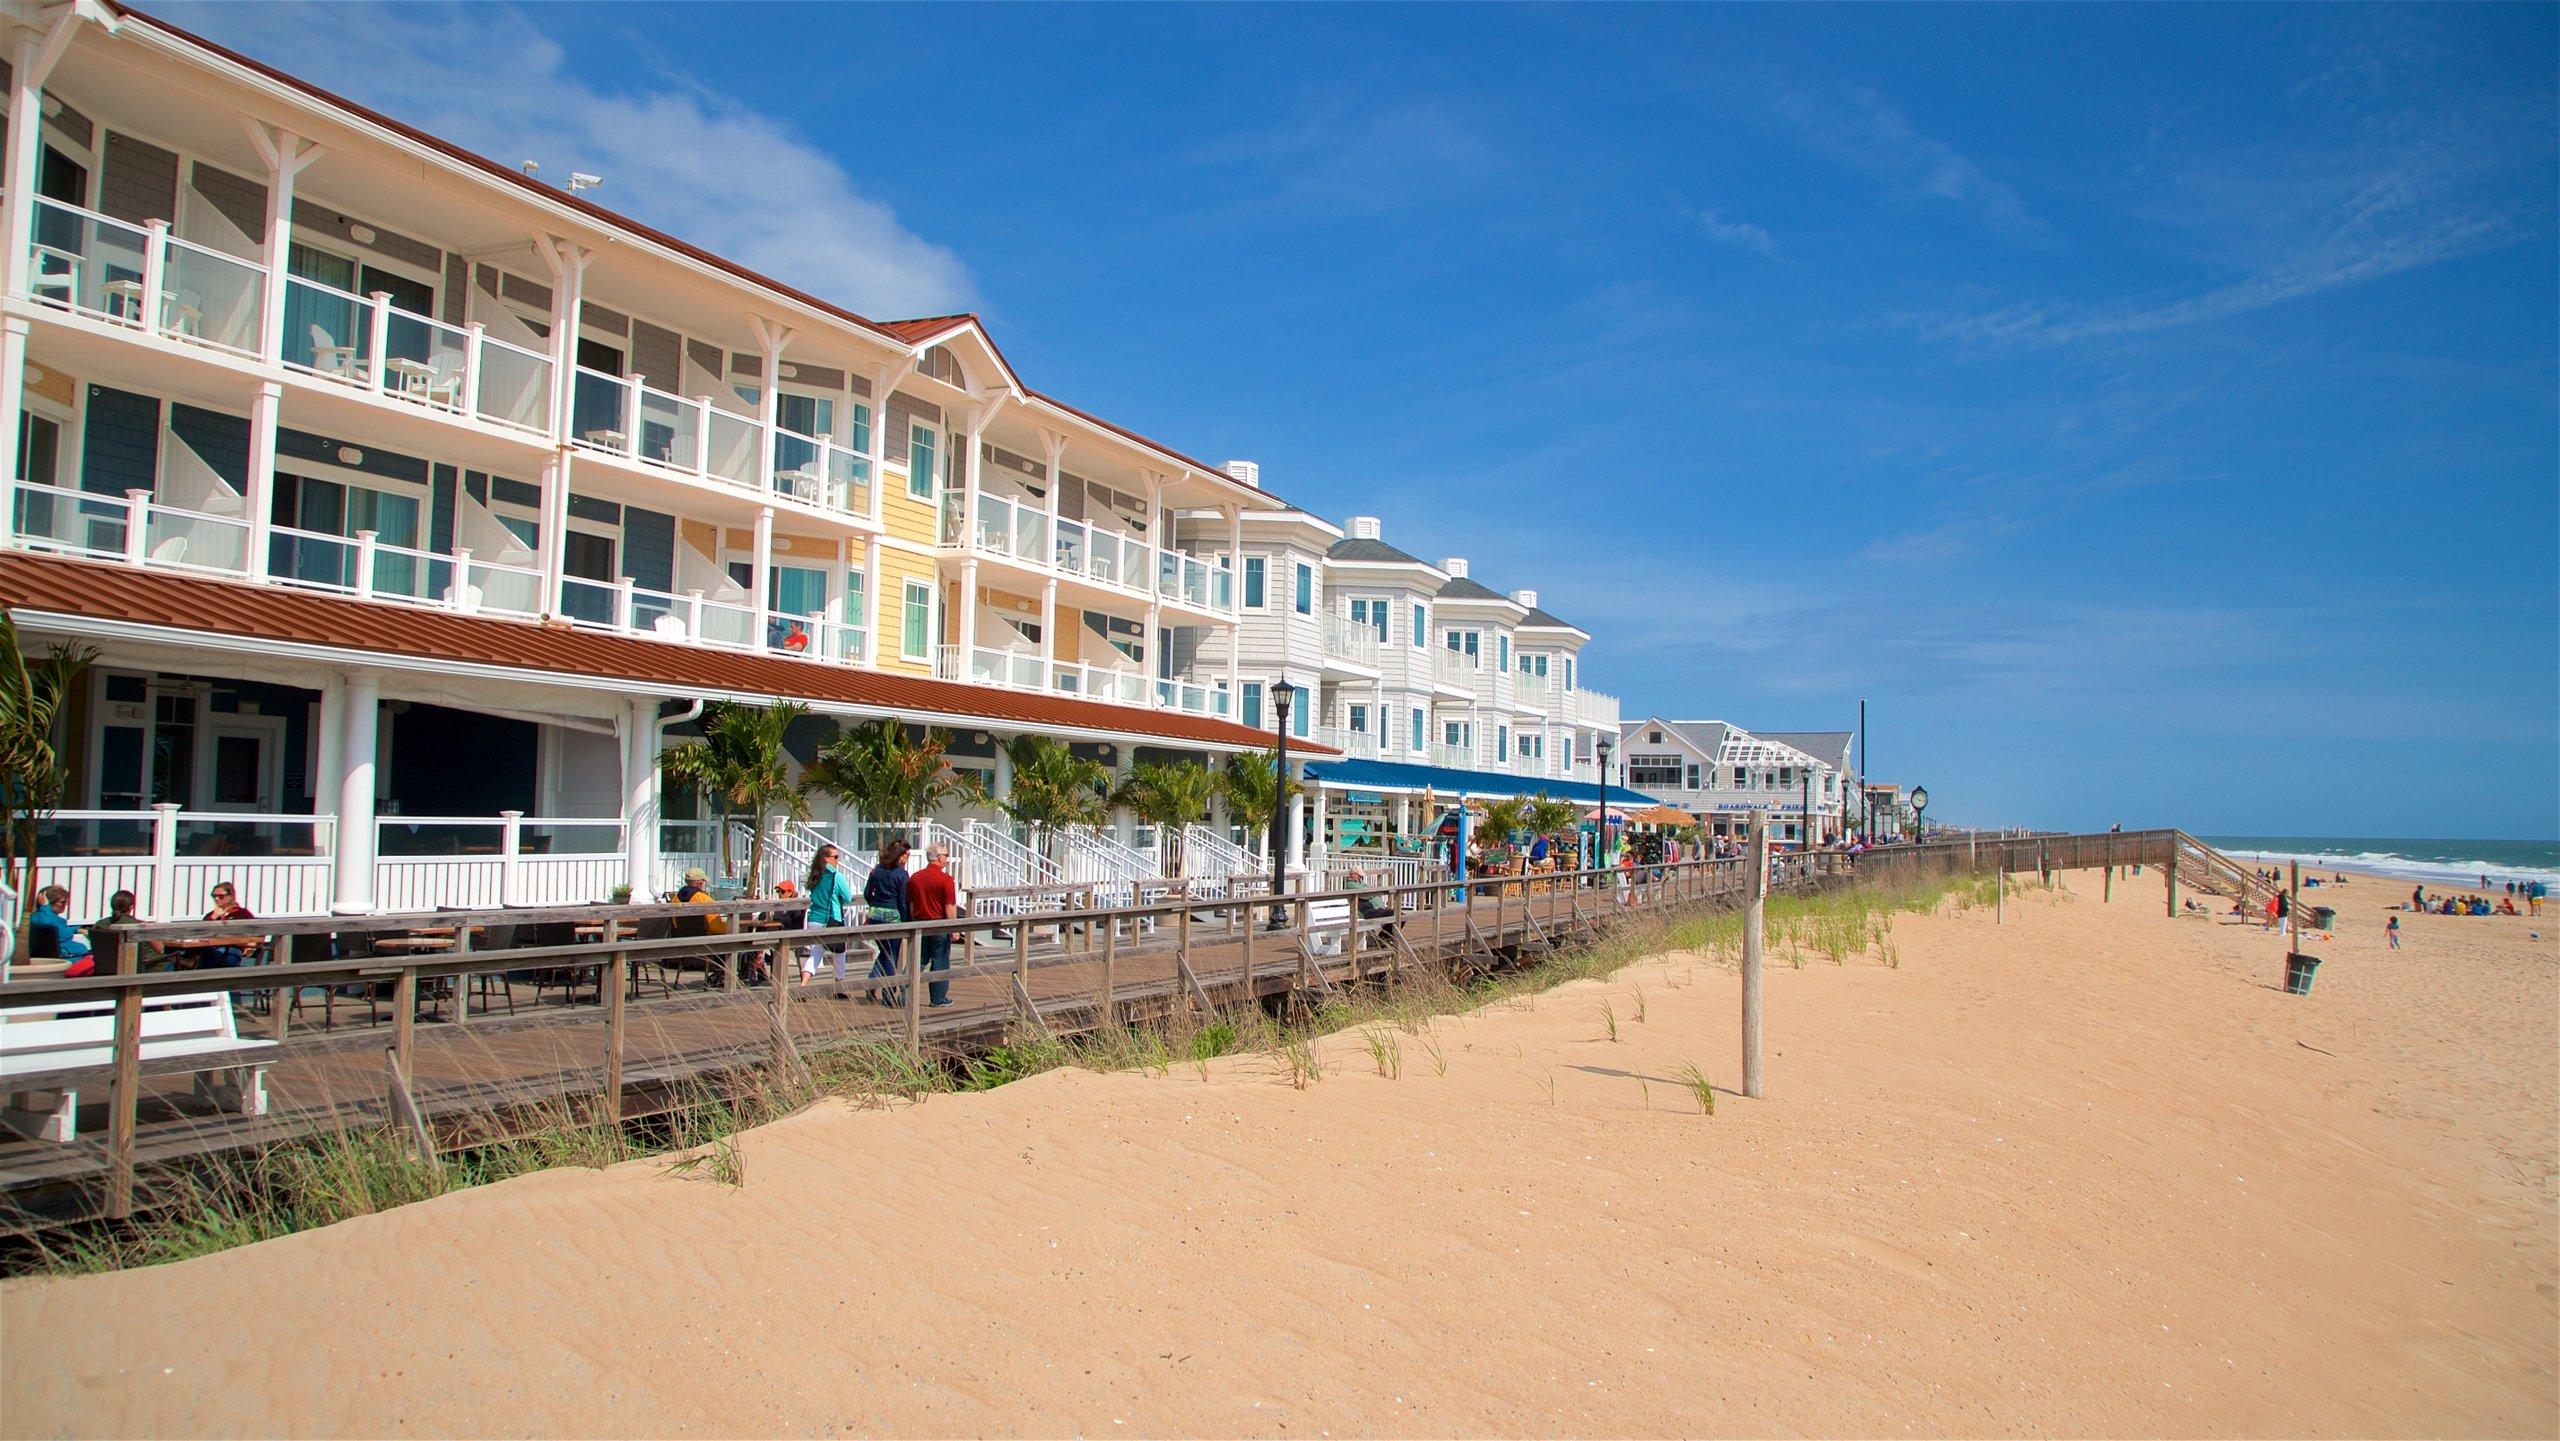 Bethany Beach Hotels From 109